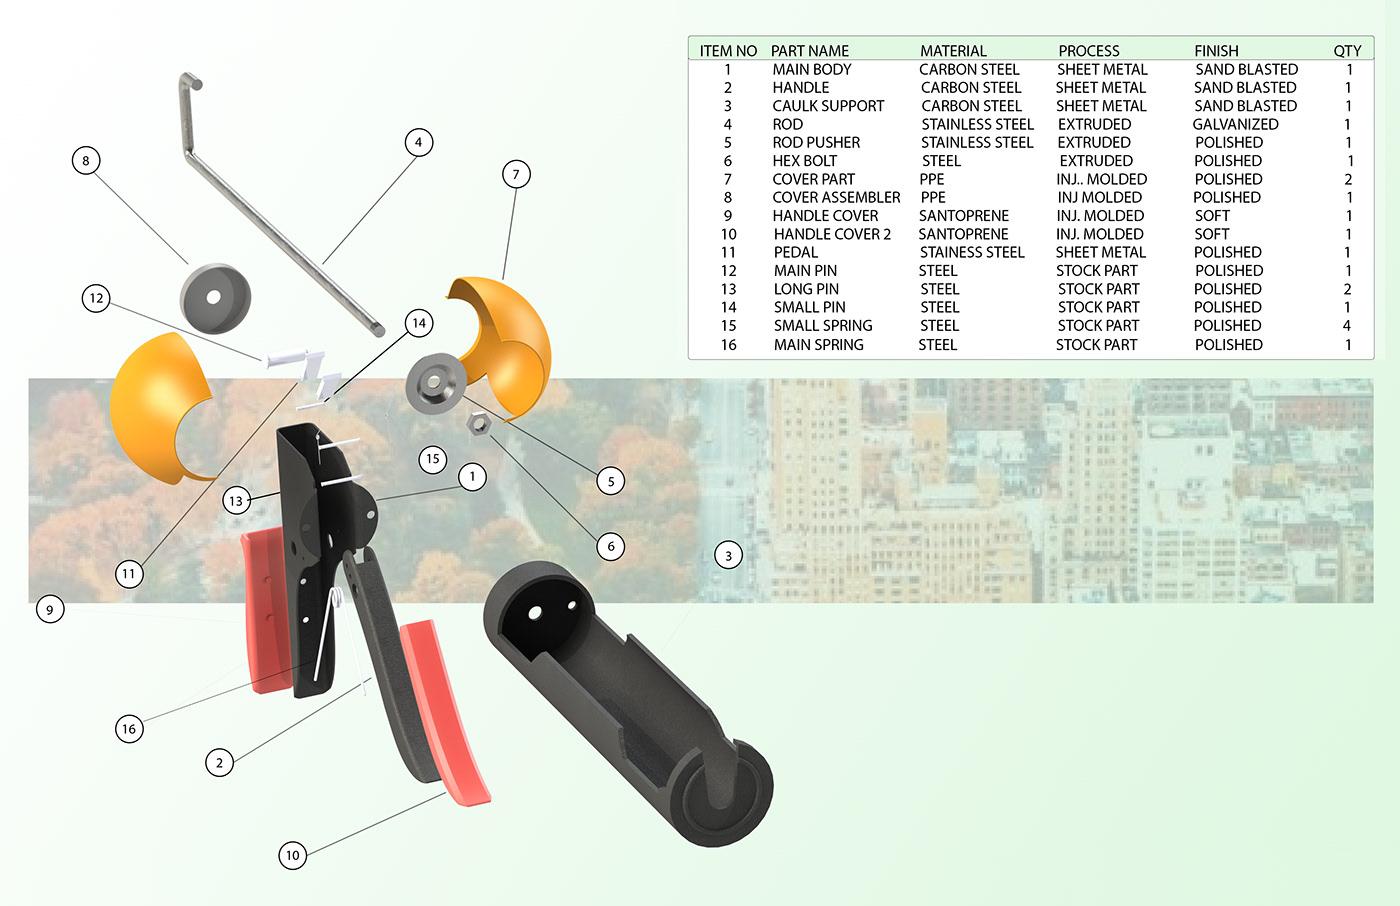 caulk gun caulk caulking gun ergonomic Mechanical Product School Project house tool tool